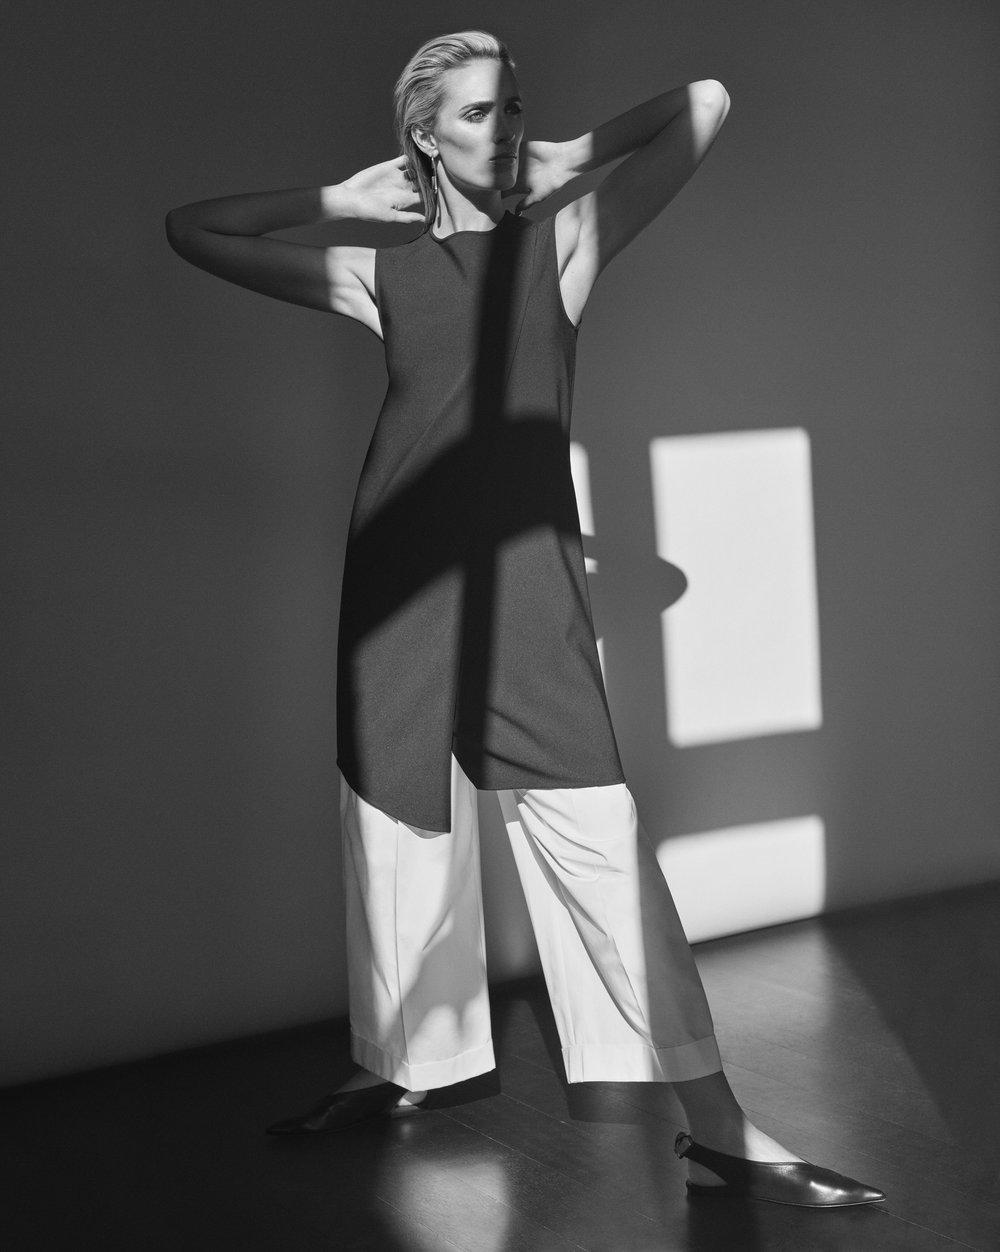 Contributors - PhotographyFred JonnyStylistElise SandvikModelMarion CelineHair & MakeupMarte Hesvik at Style ManagementPhoto AssistantYoo SunStyling AssistantDina HansenRetouchEgo Studios